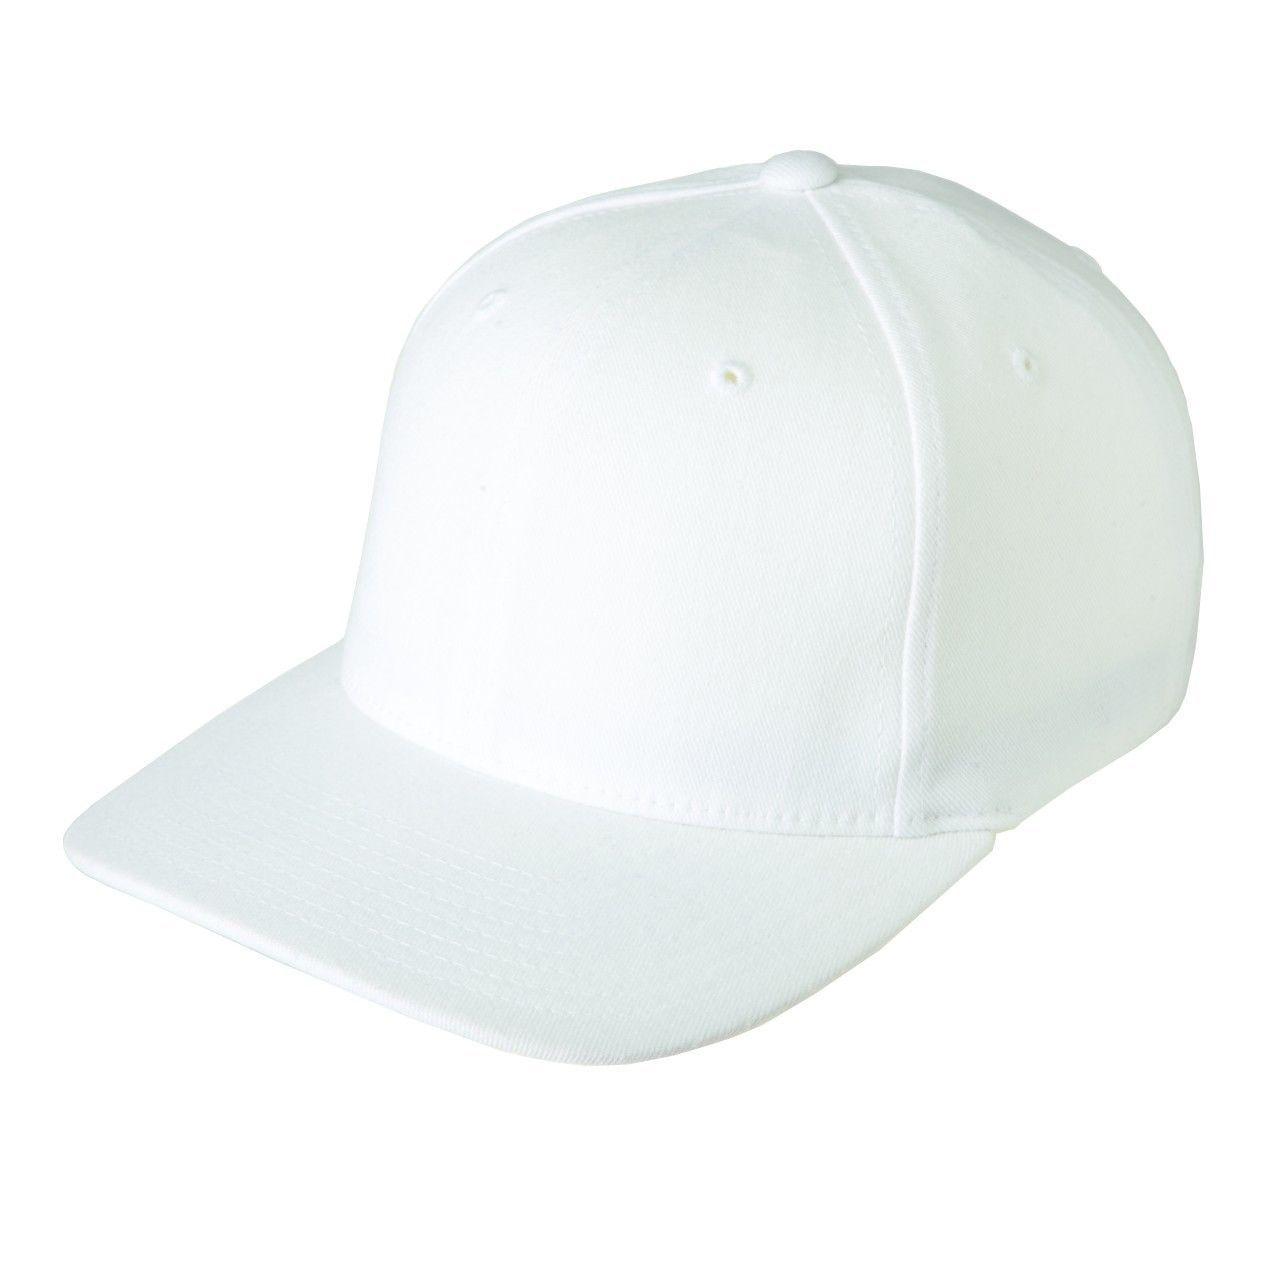 Flexfit yupoong plain baseball hat